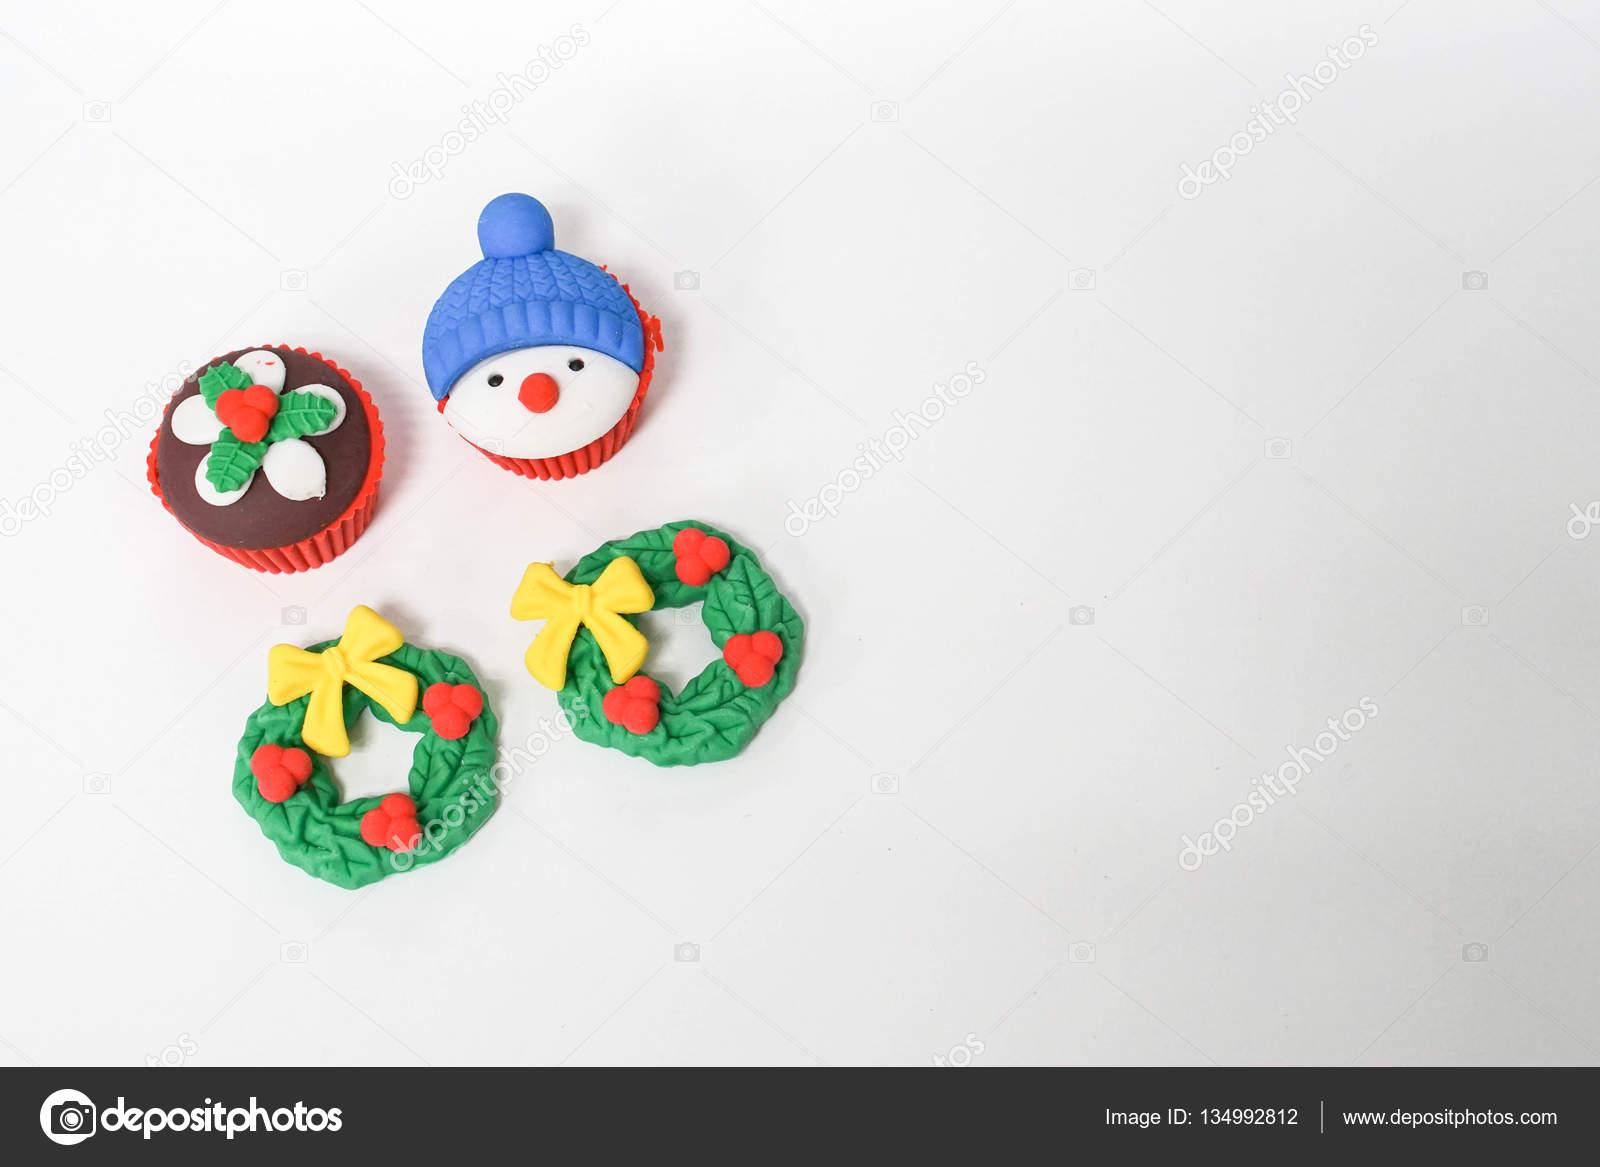 Saison Gruß Symbol Weihnachtsfeier — Stockfoto © Jummie #134992812